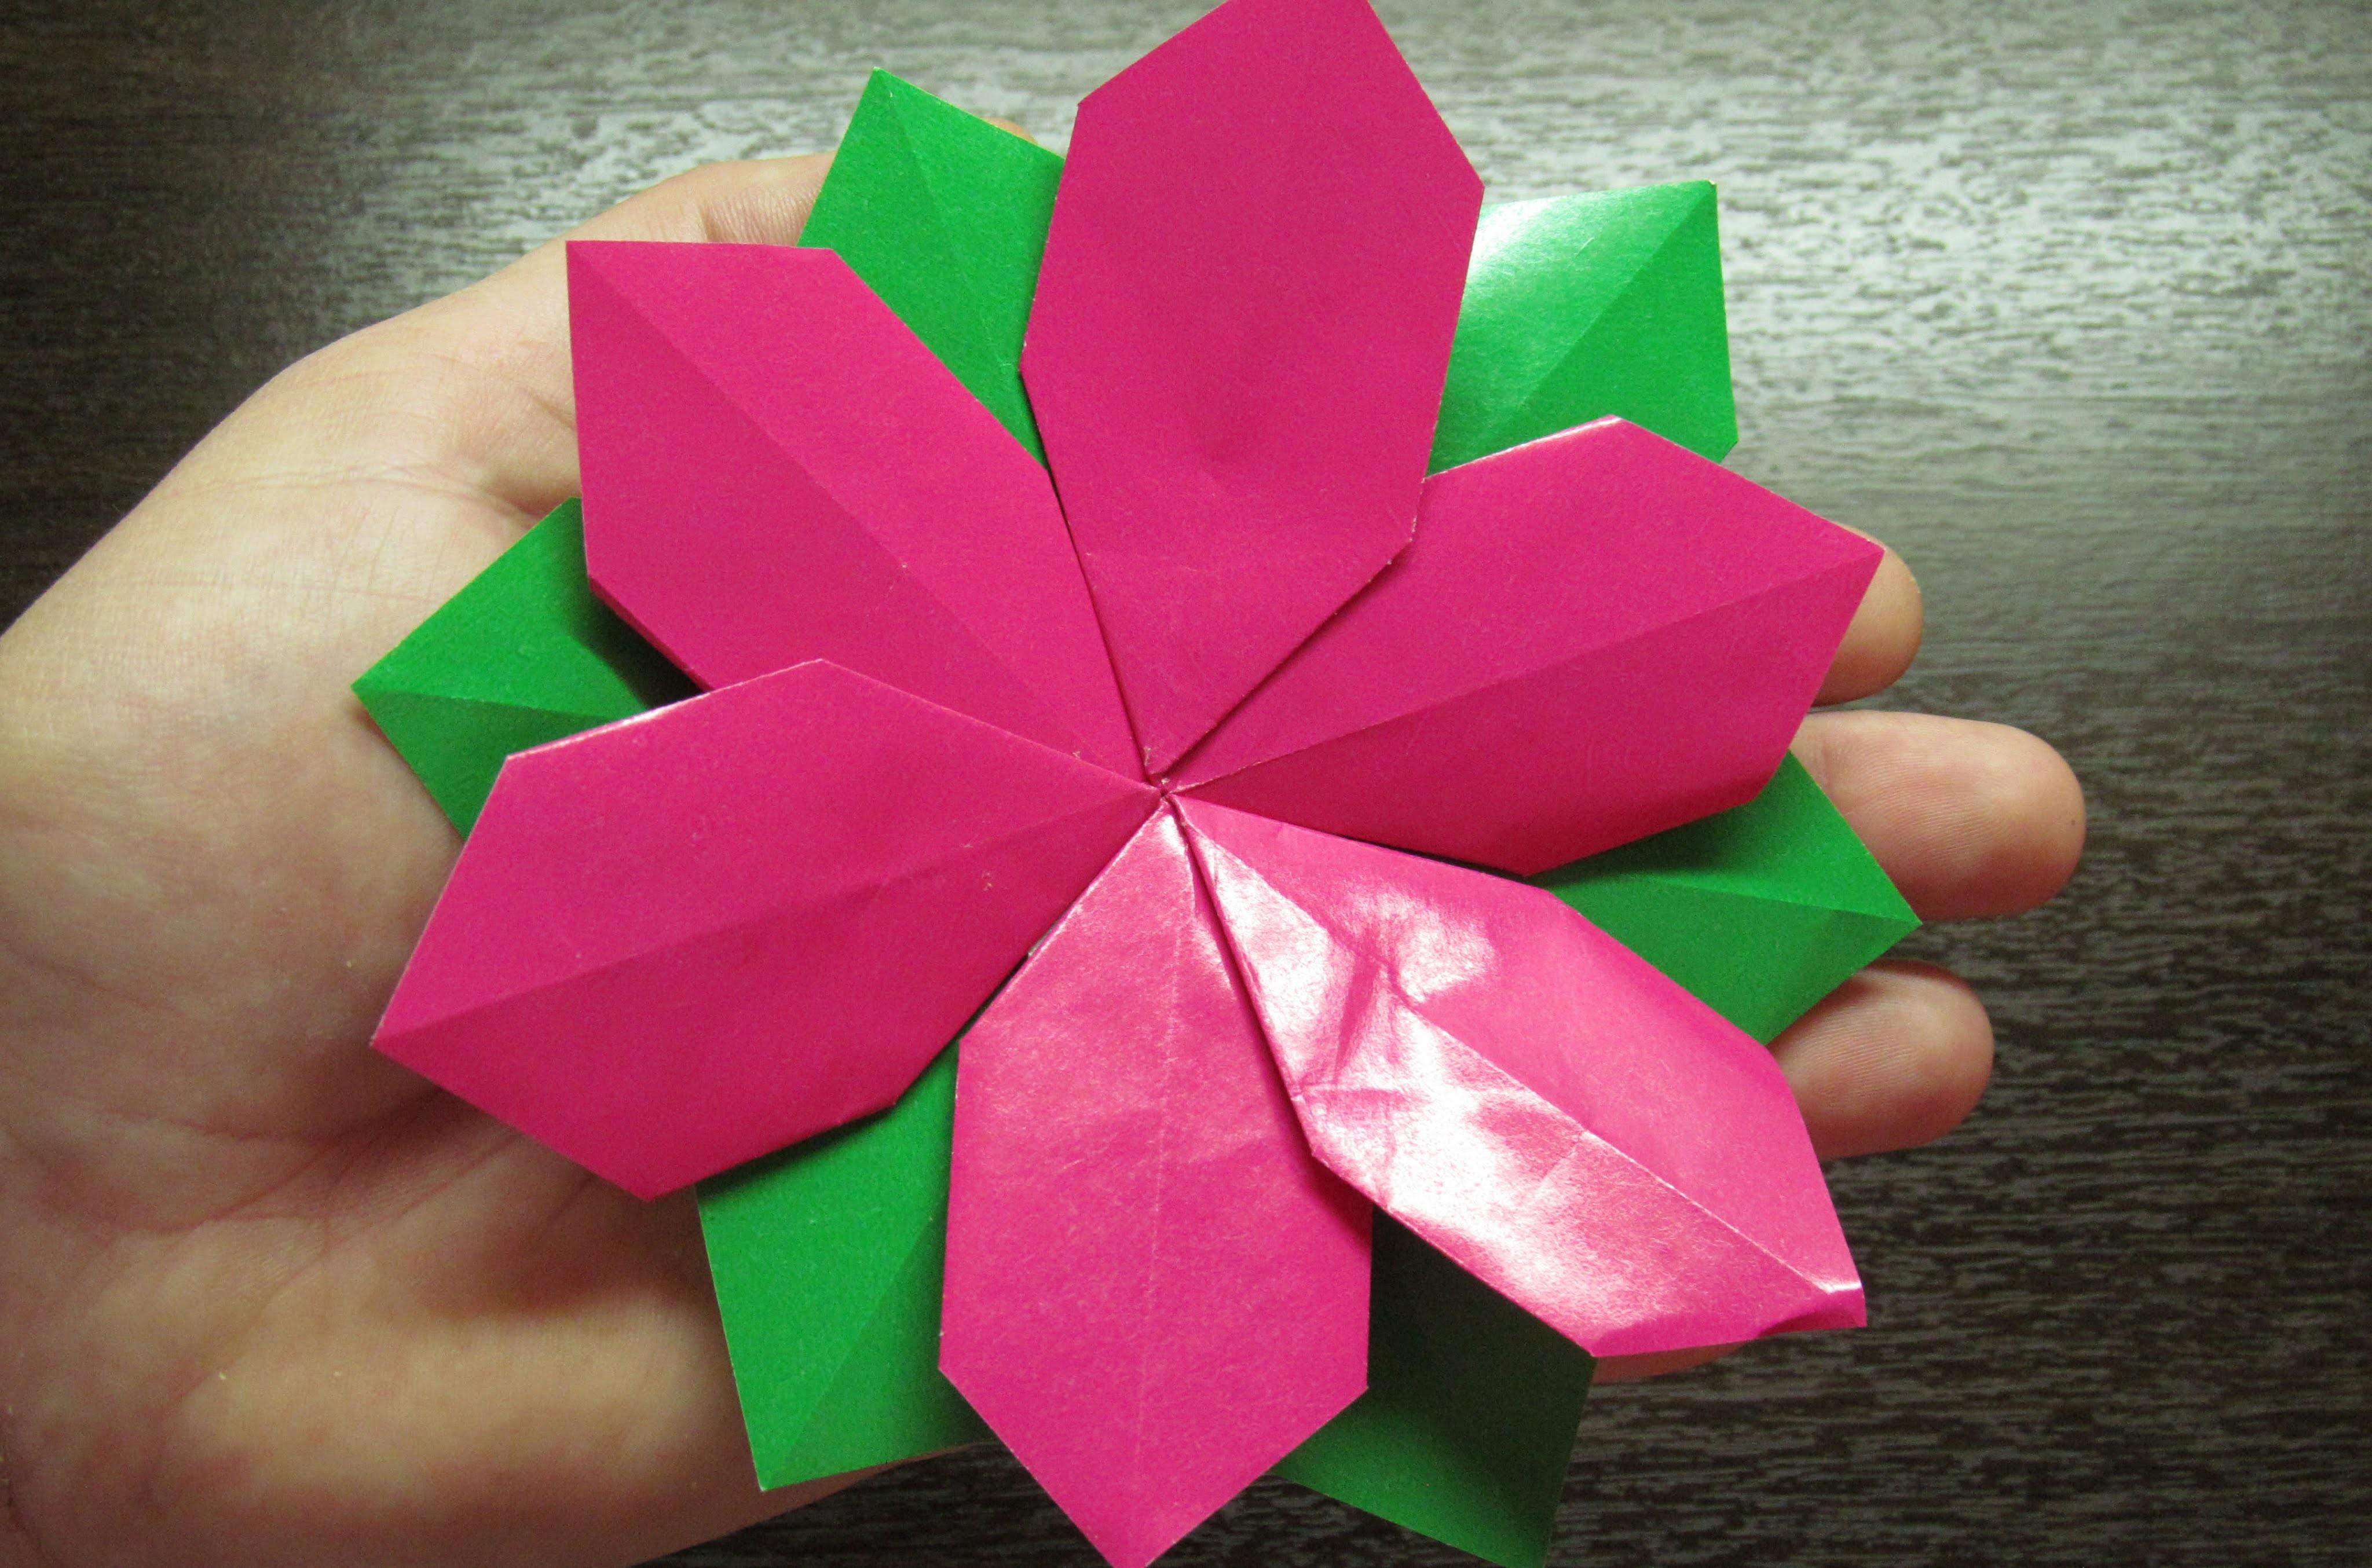 Como hacer adornos navide os para la puerta de tu casa - Adornos navidenos casa ...